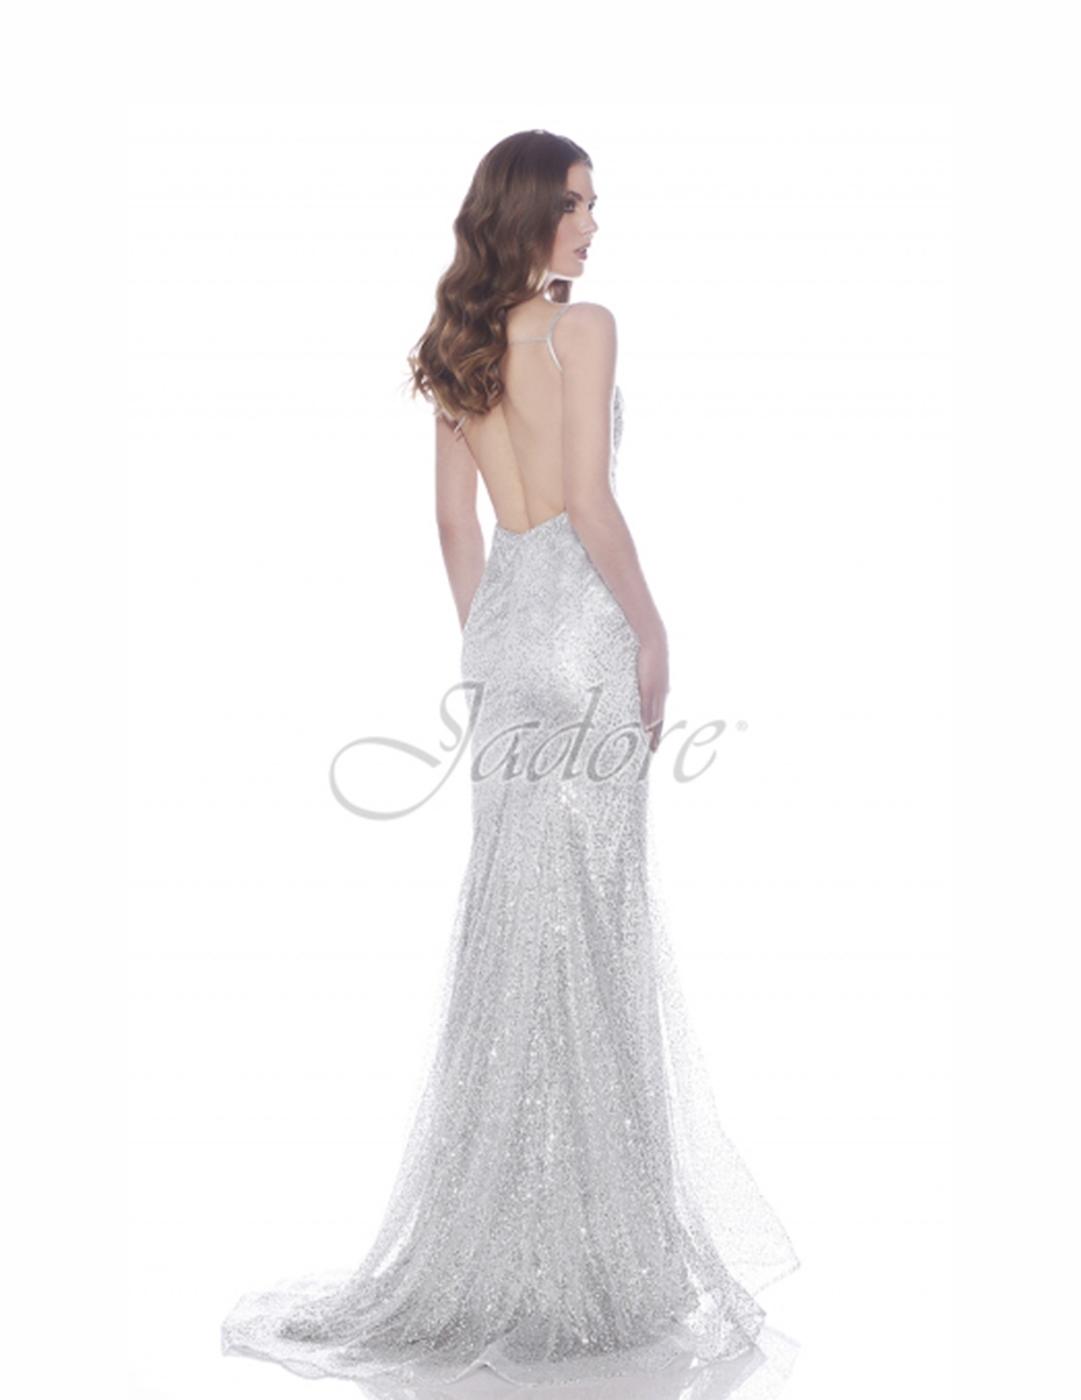 cd20446023c Mother of the Bride Dress by Jadore Jadore J7 Collection - J7064